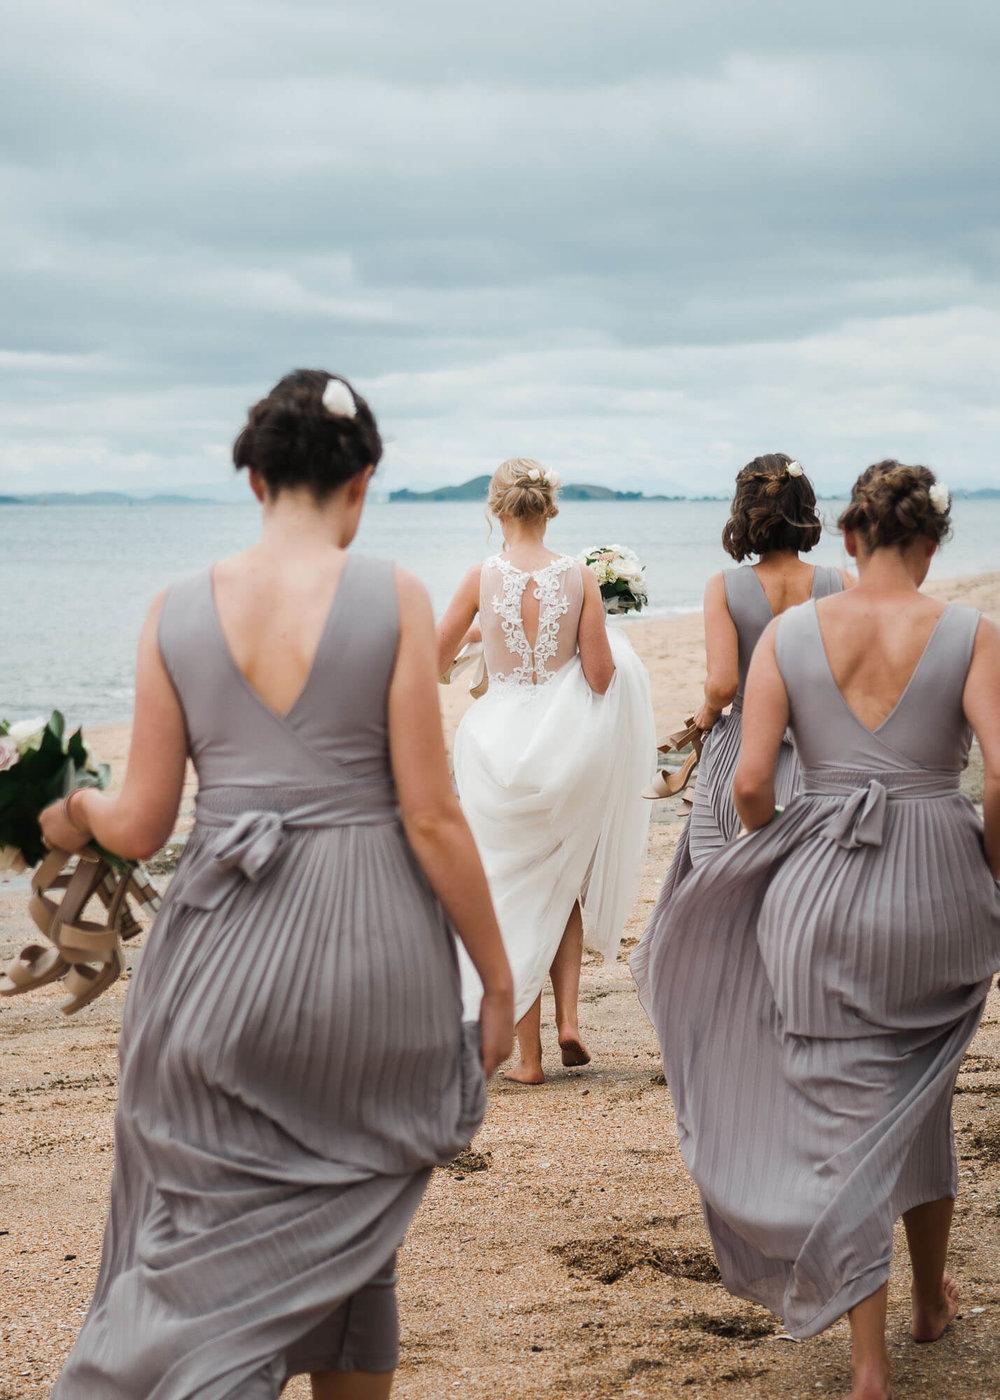 bride-and-bridesmaids-walk-barefoot-down-beach.jpg